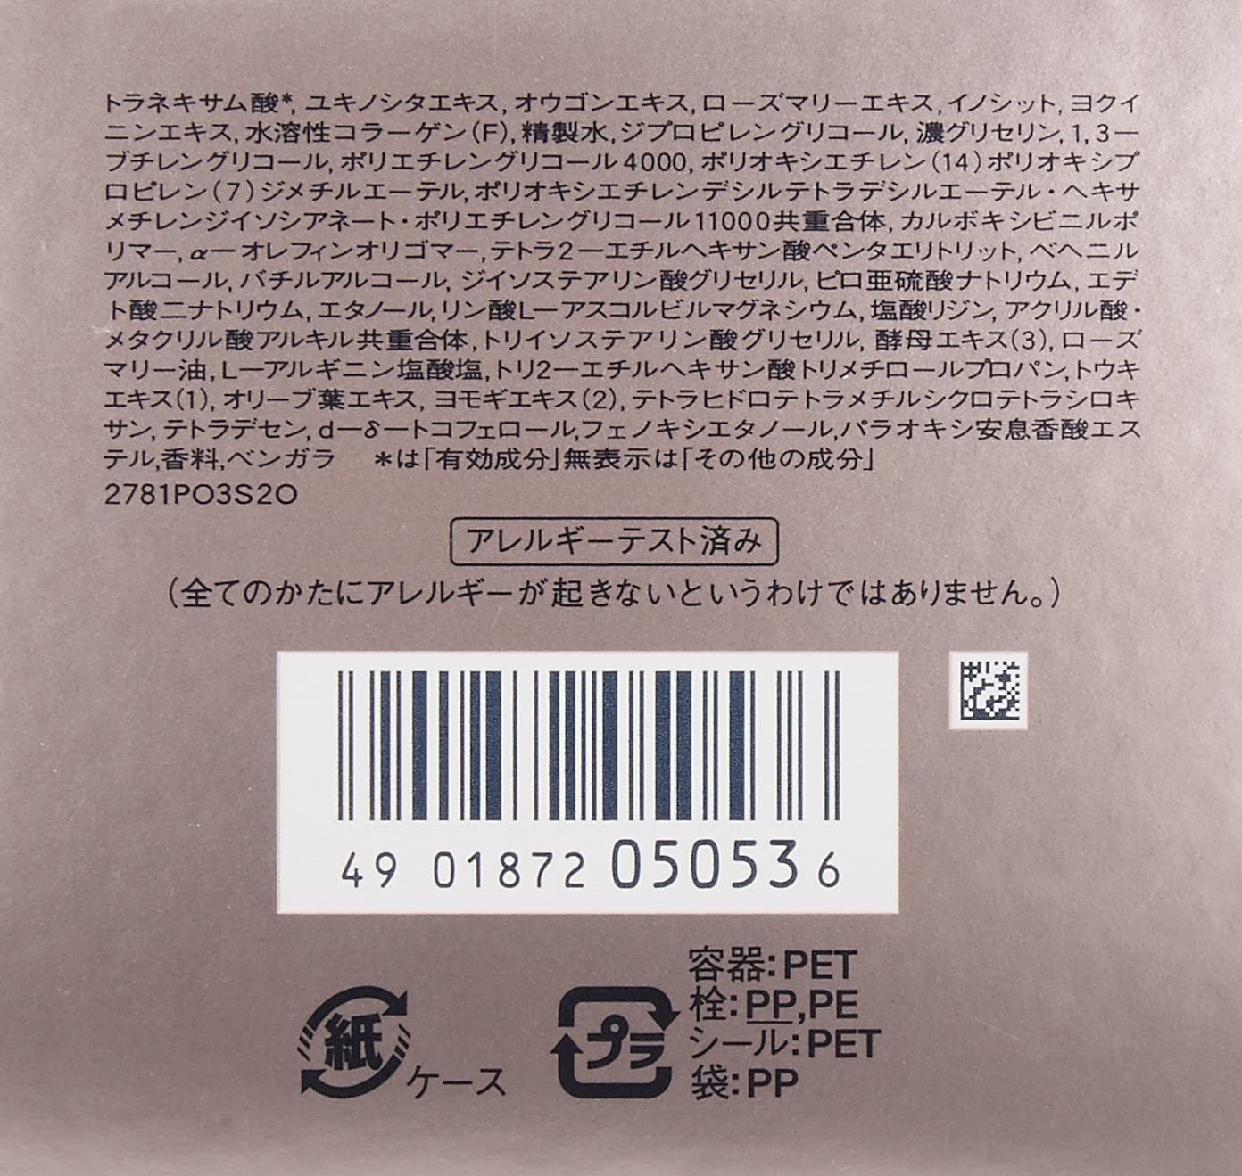 ELIXIR(エリクシール)ホワイト スリーピングクリアパック Cの商品画像13